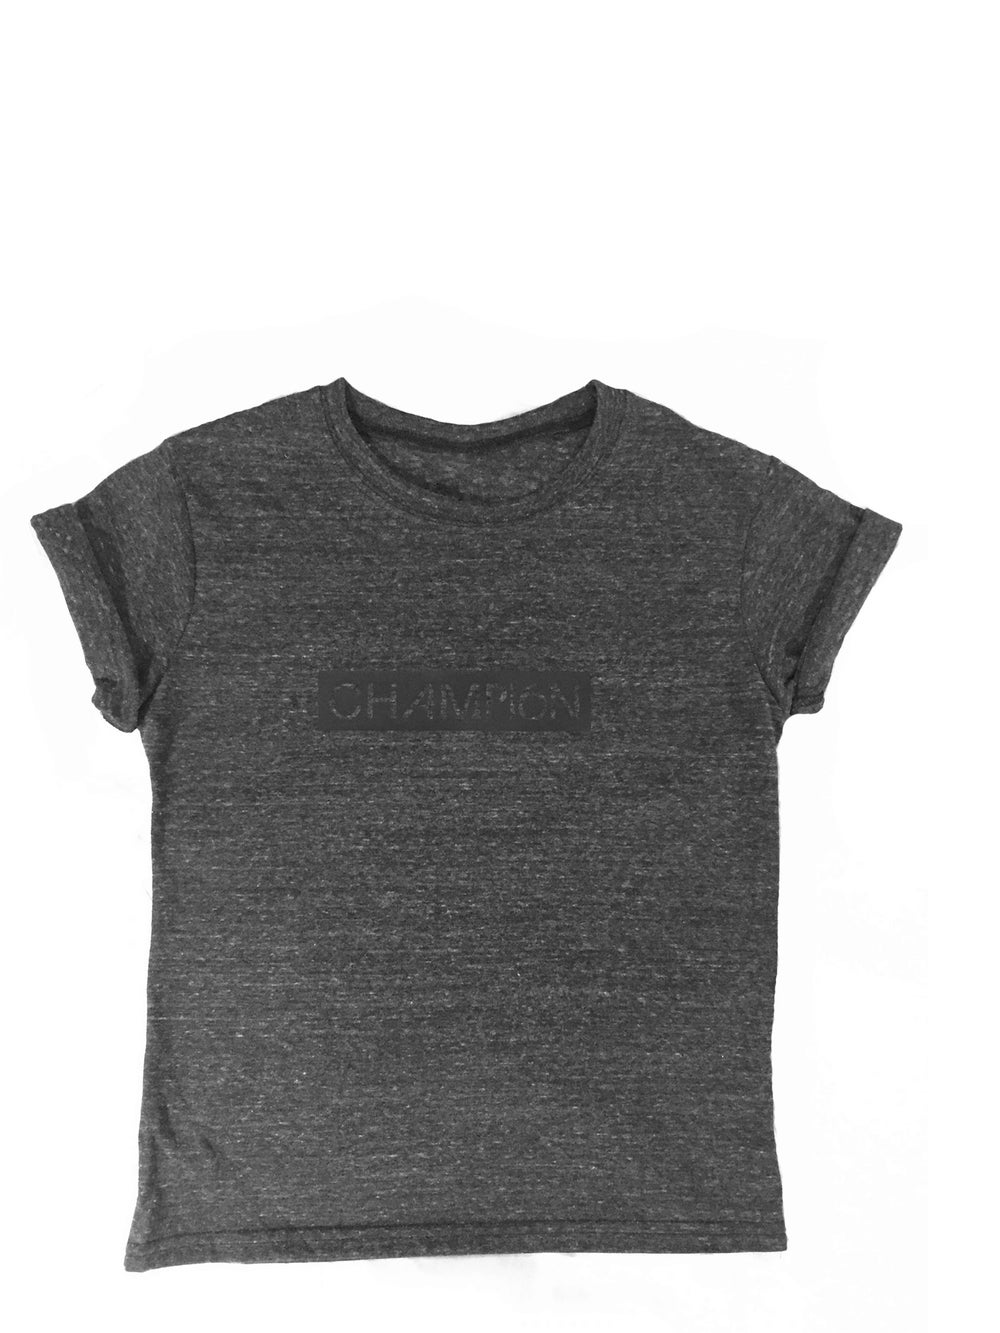 Image of unisex kids recycled block t-shirt